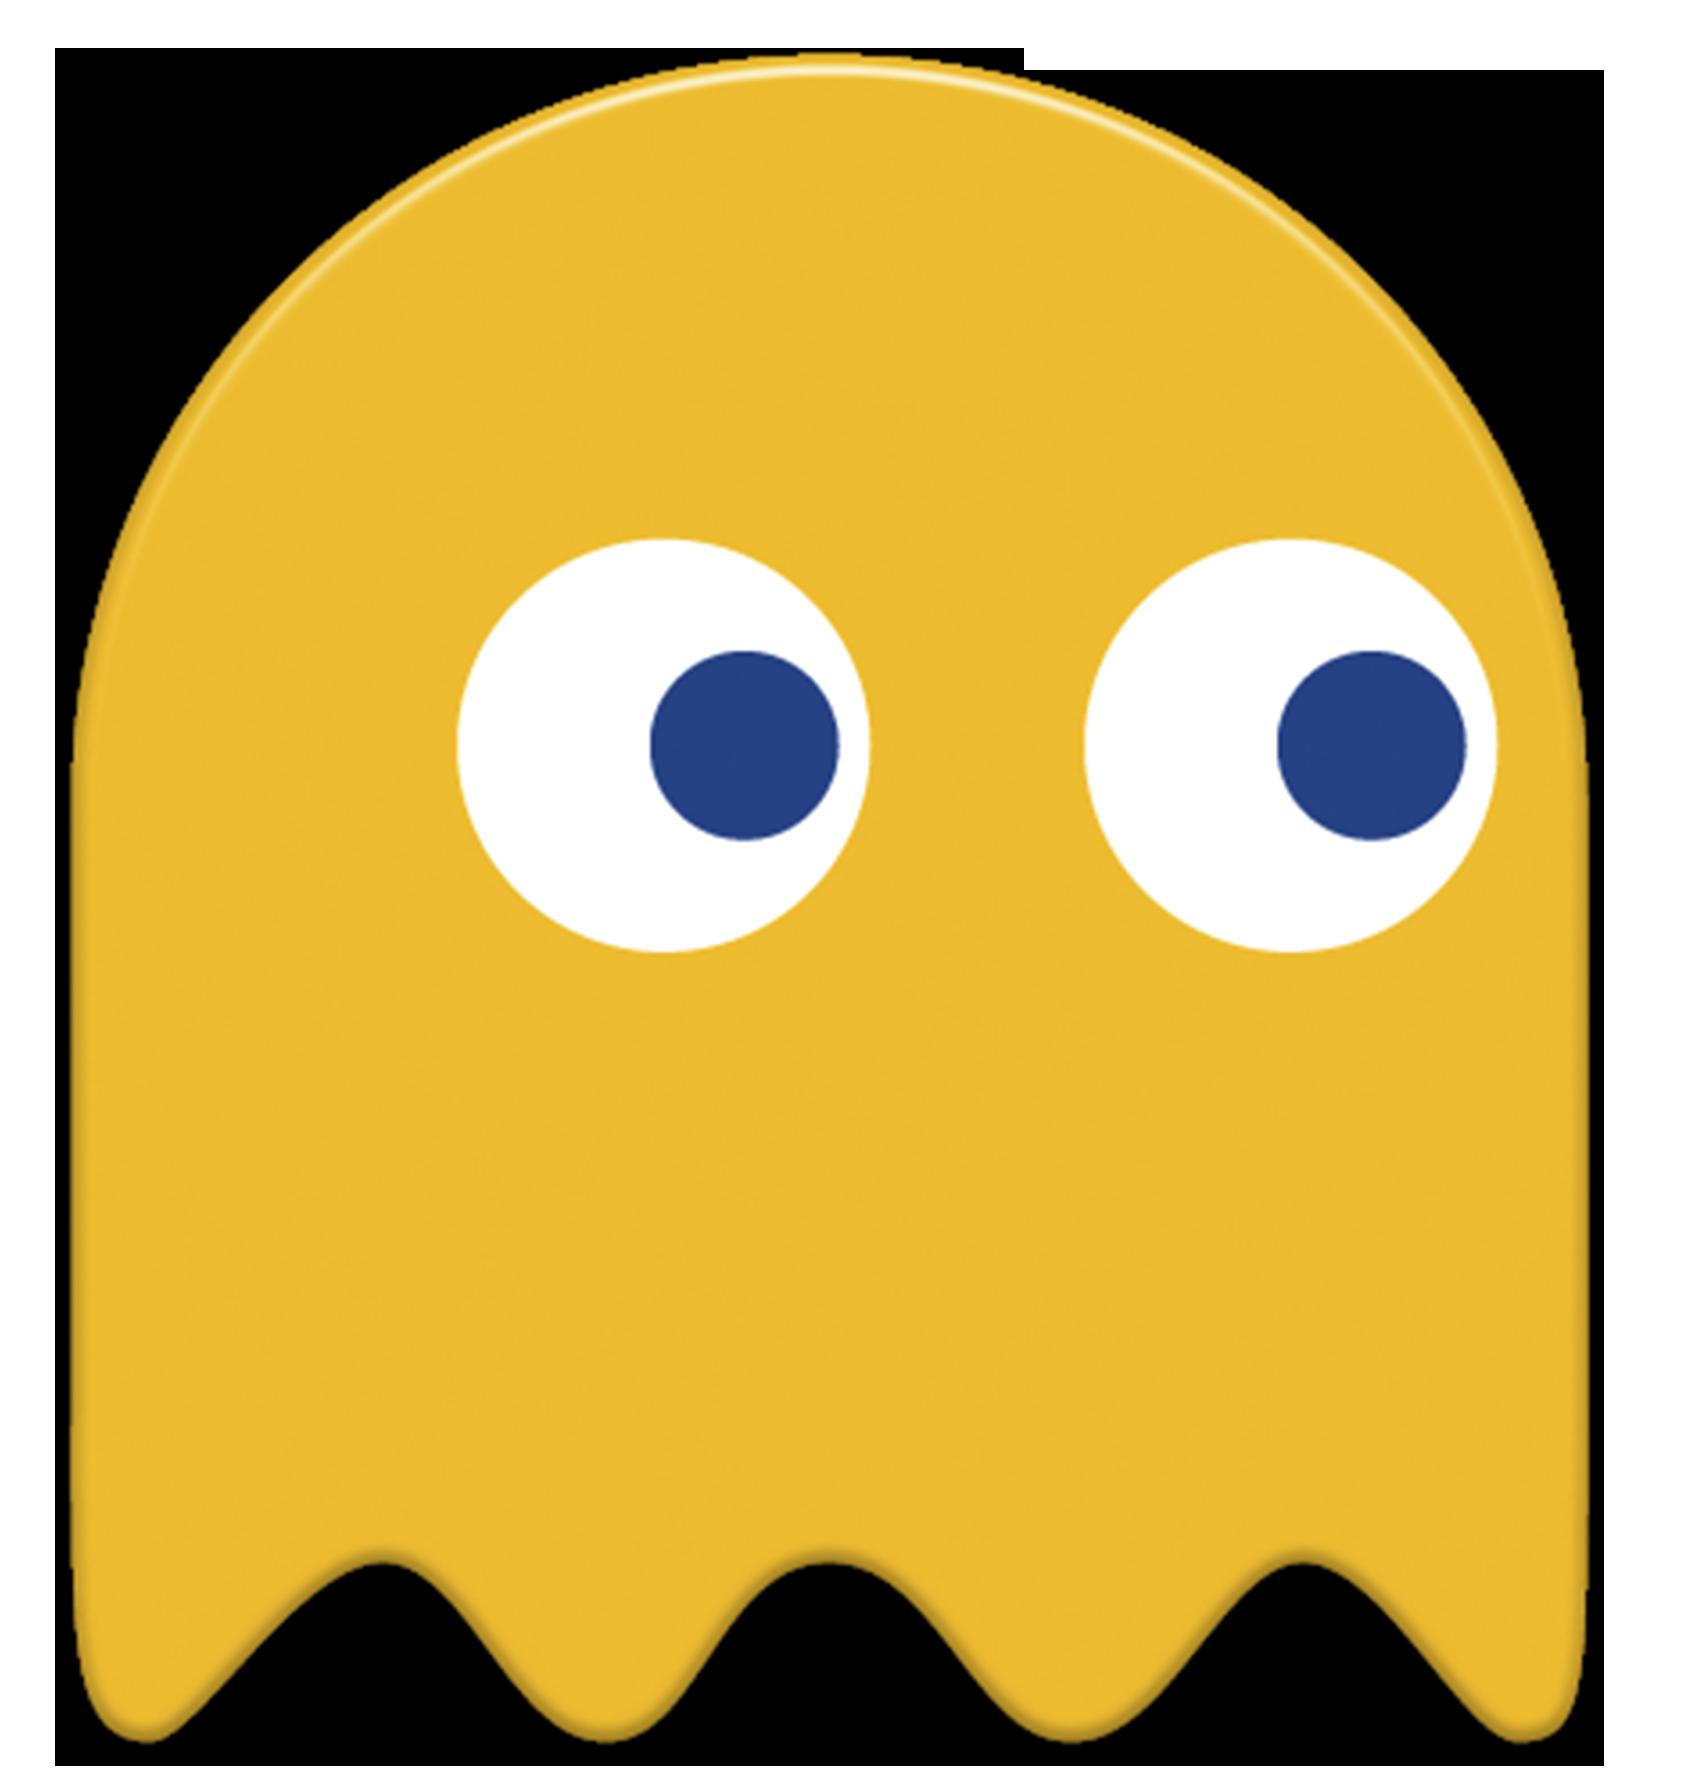 Fantasmas de pacman png 7 » PNG Image.